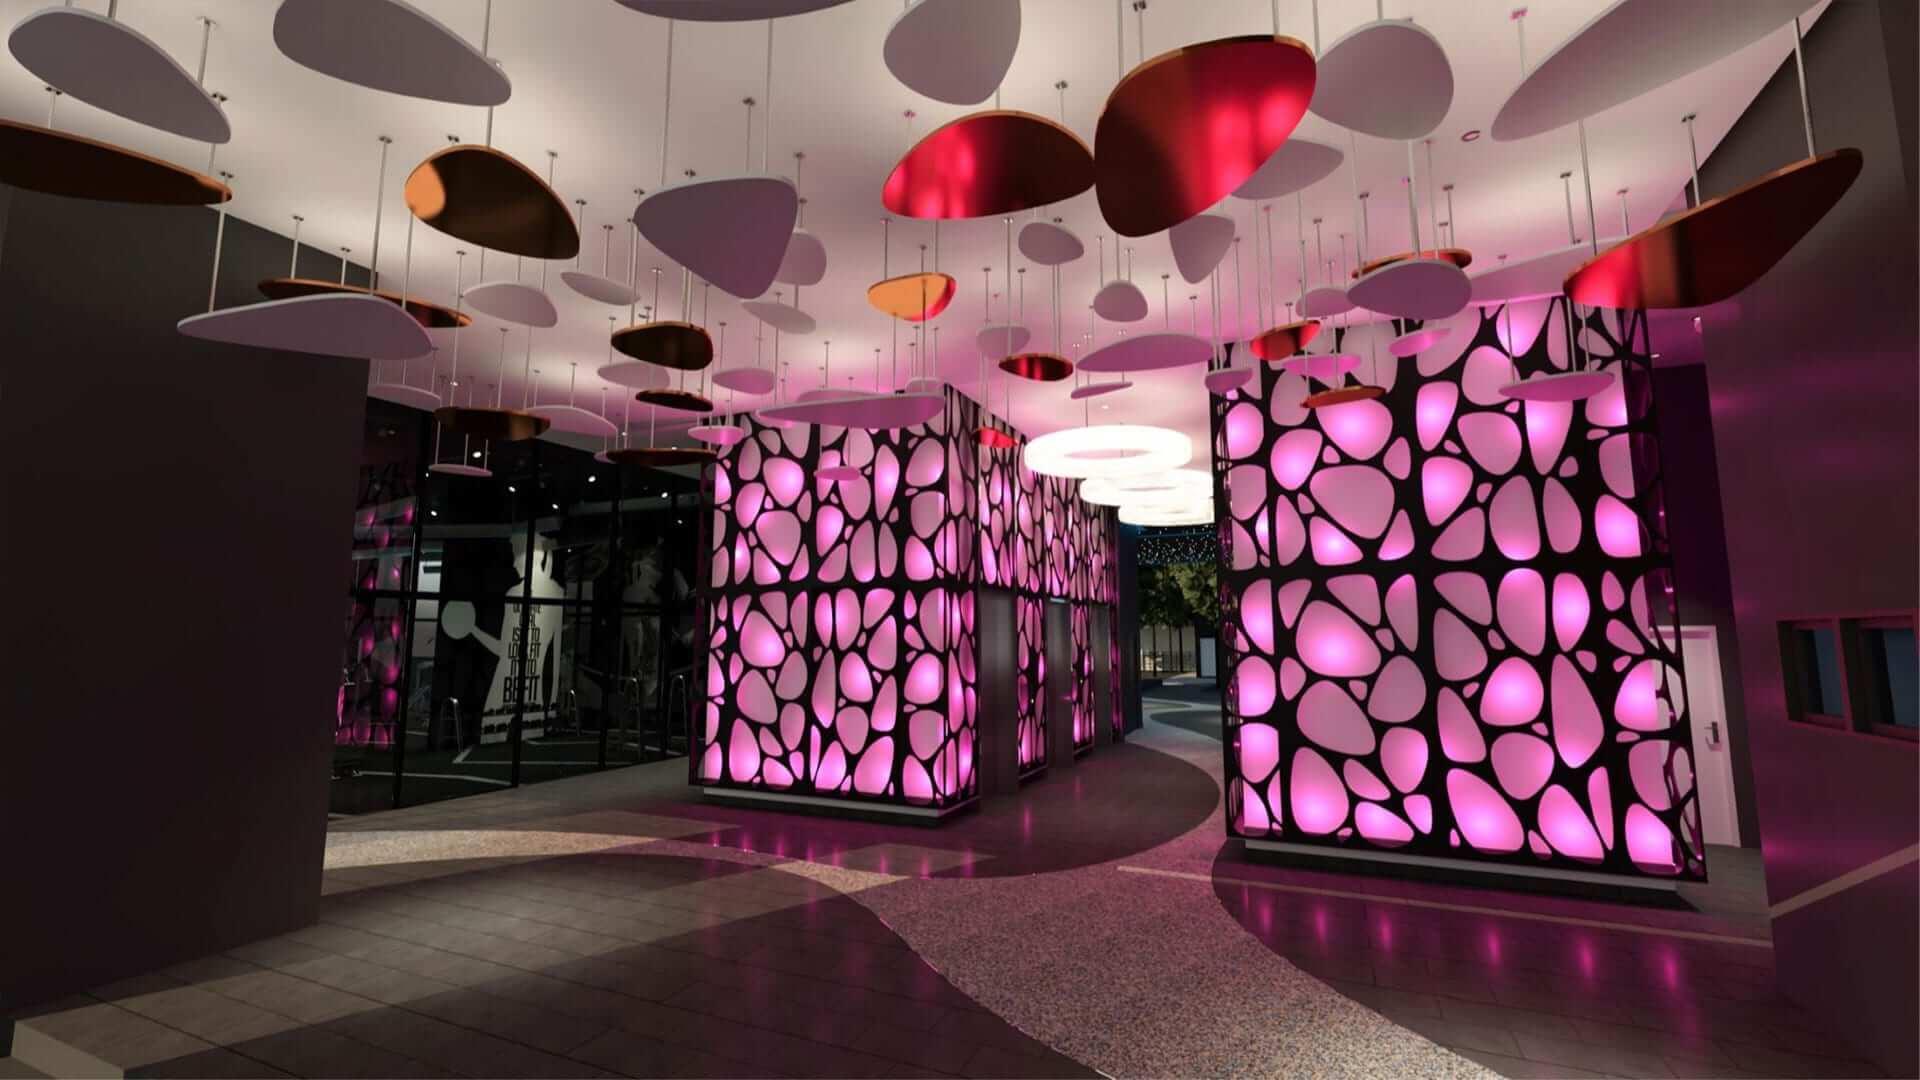 KR7 Lift Lobby (Level 6)